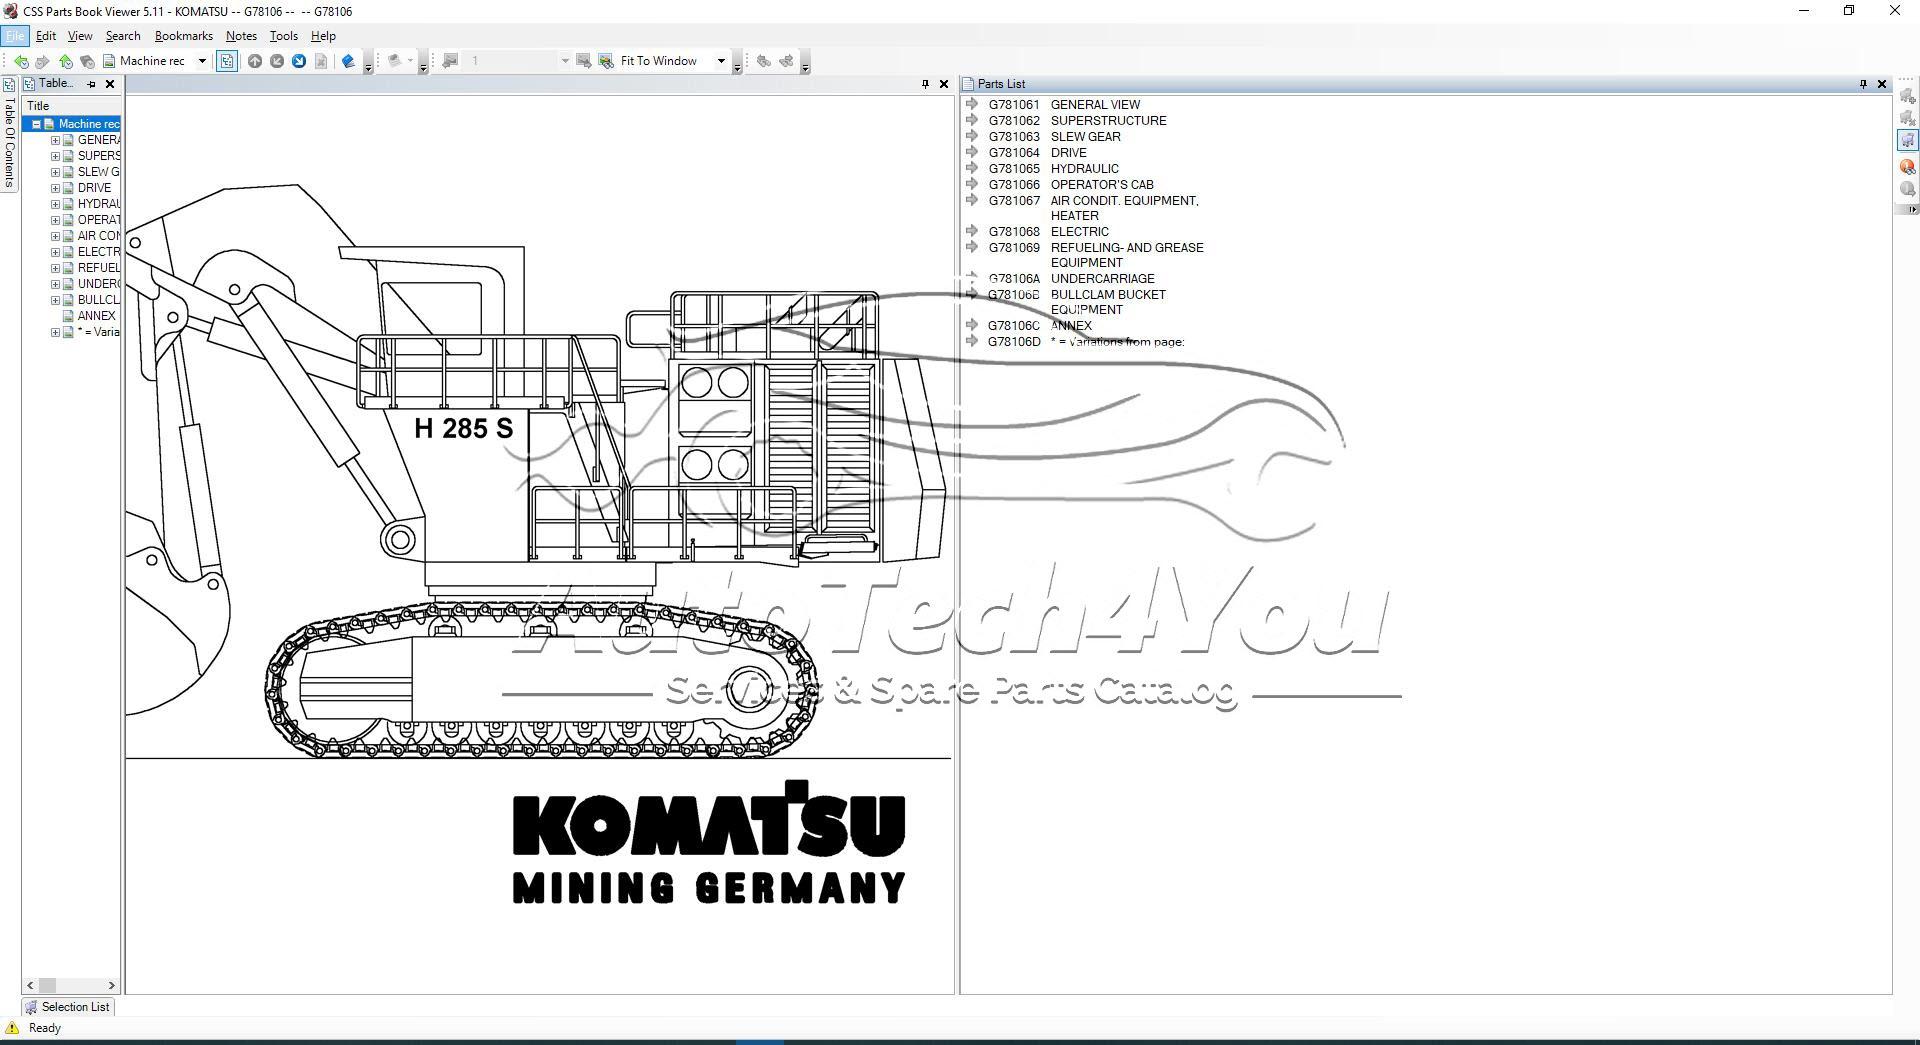 Komatsu Construction